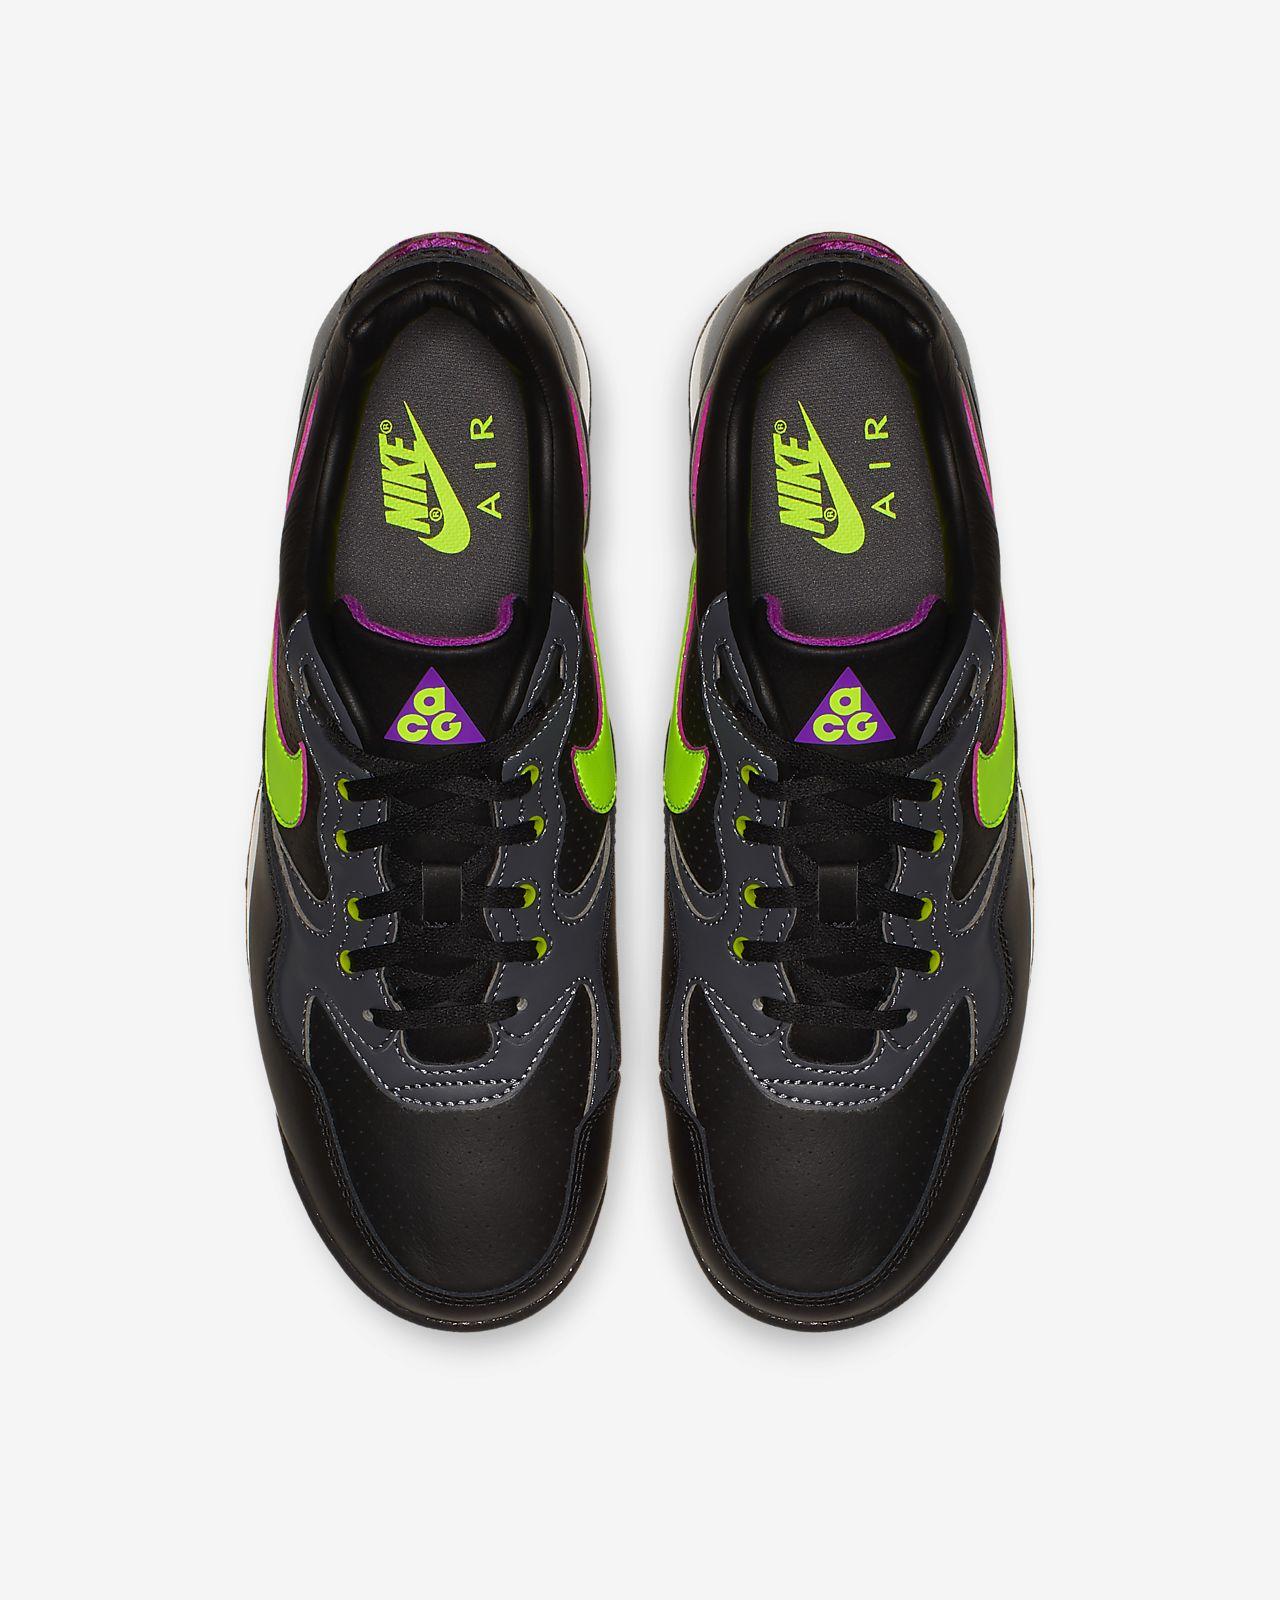 Nike Chaussure Air Pour Wildwood Acg Homme kuZXPOiT